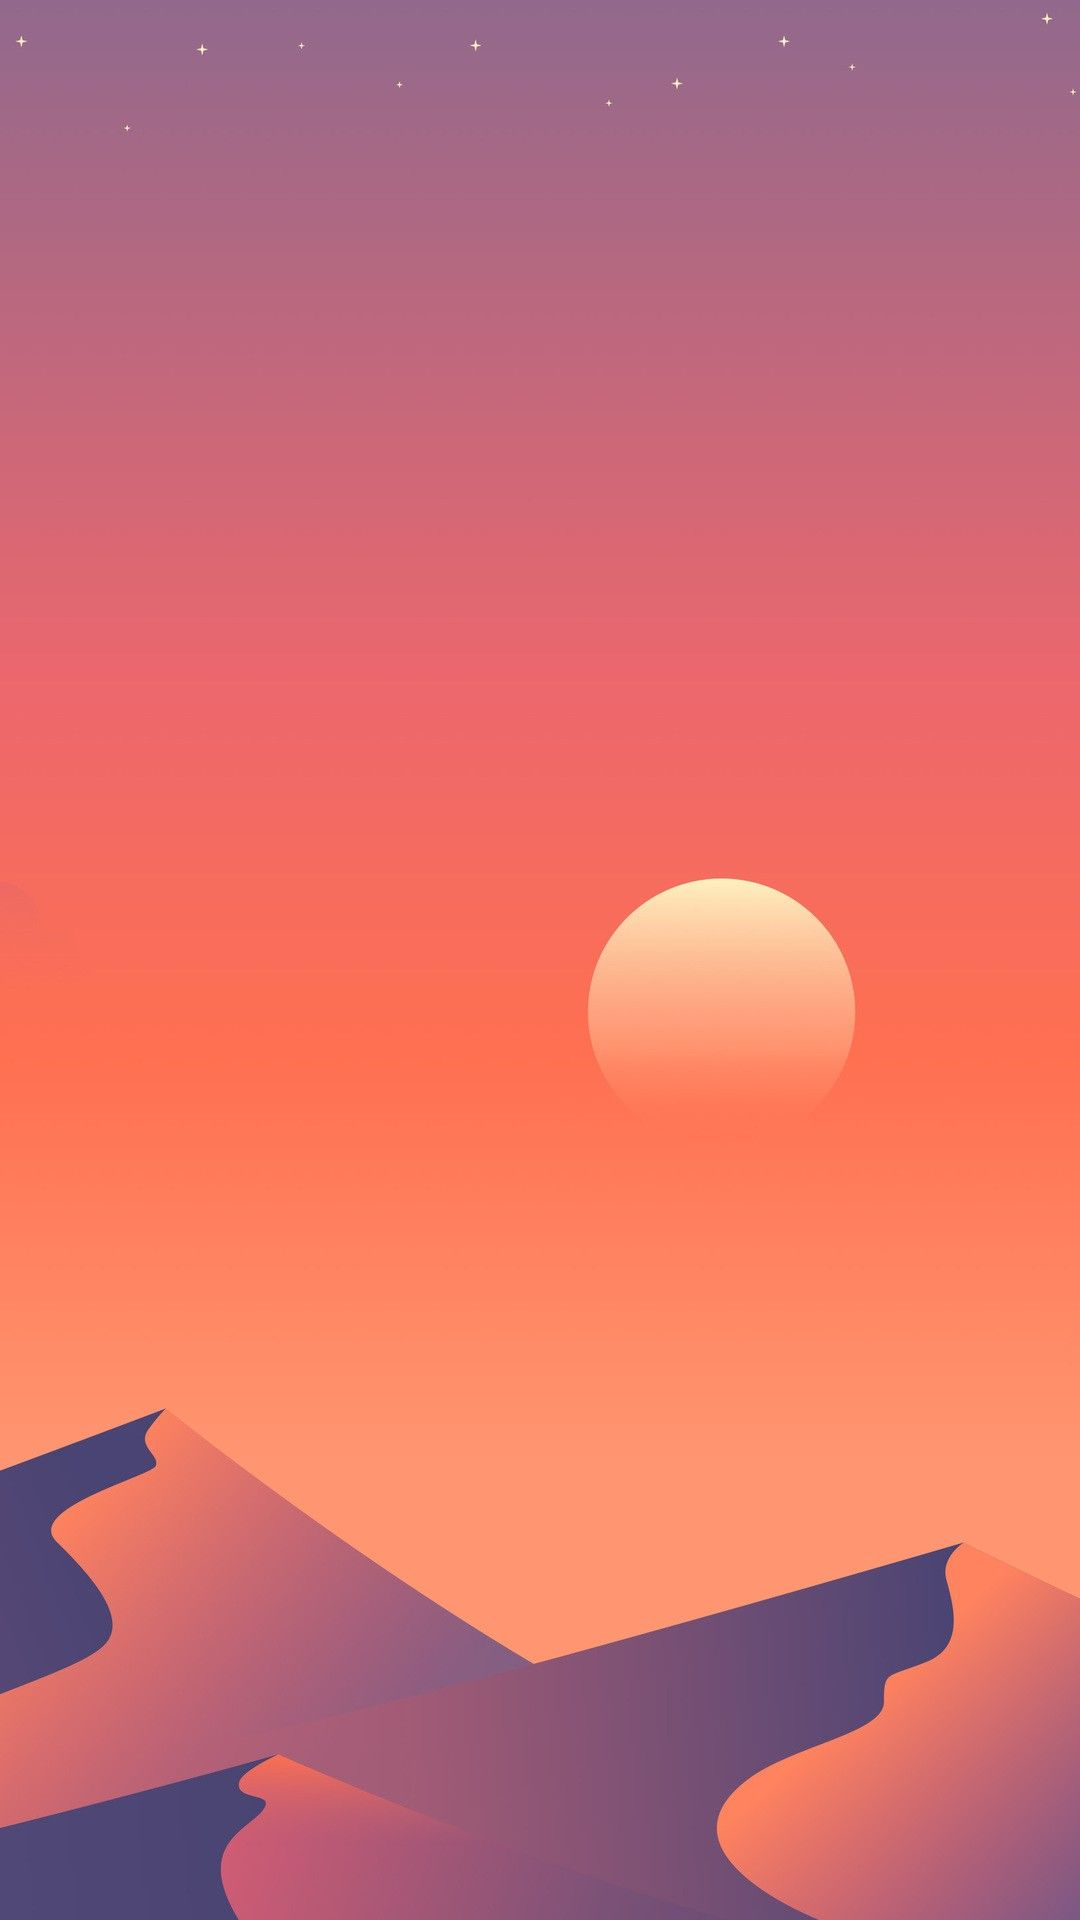 34 Best Free Xiaomi 4k Minimalistic Phone Wallpapers Wallpaperaccess